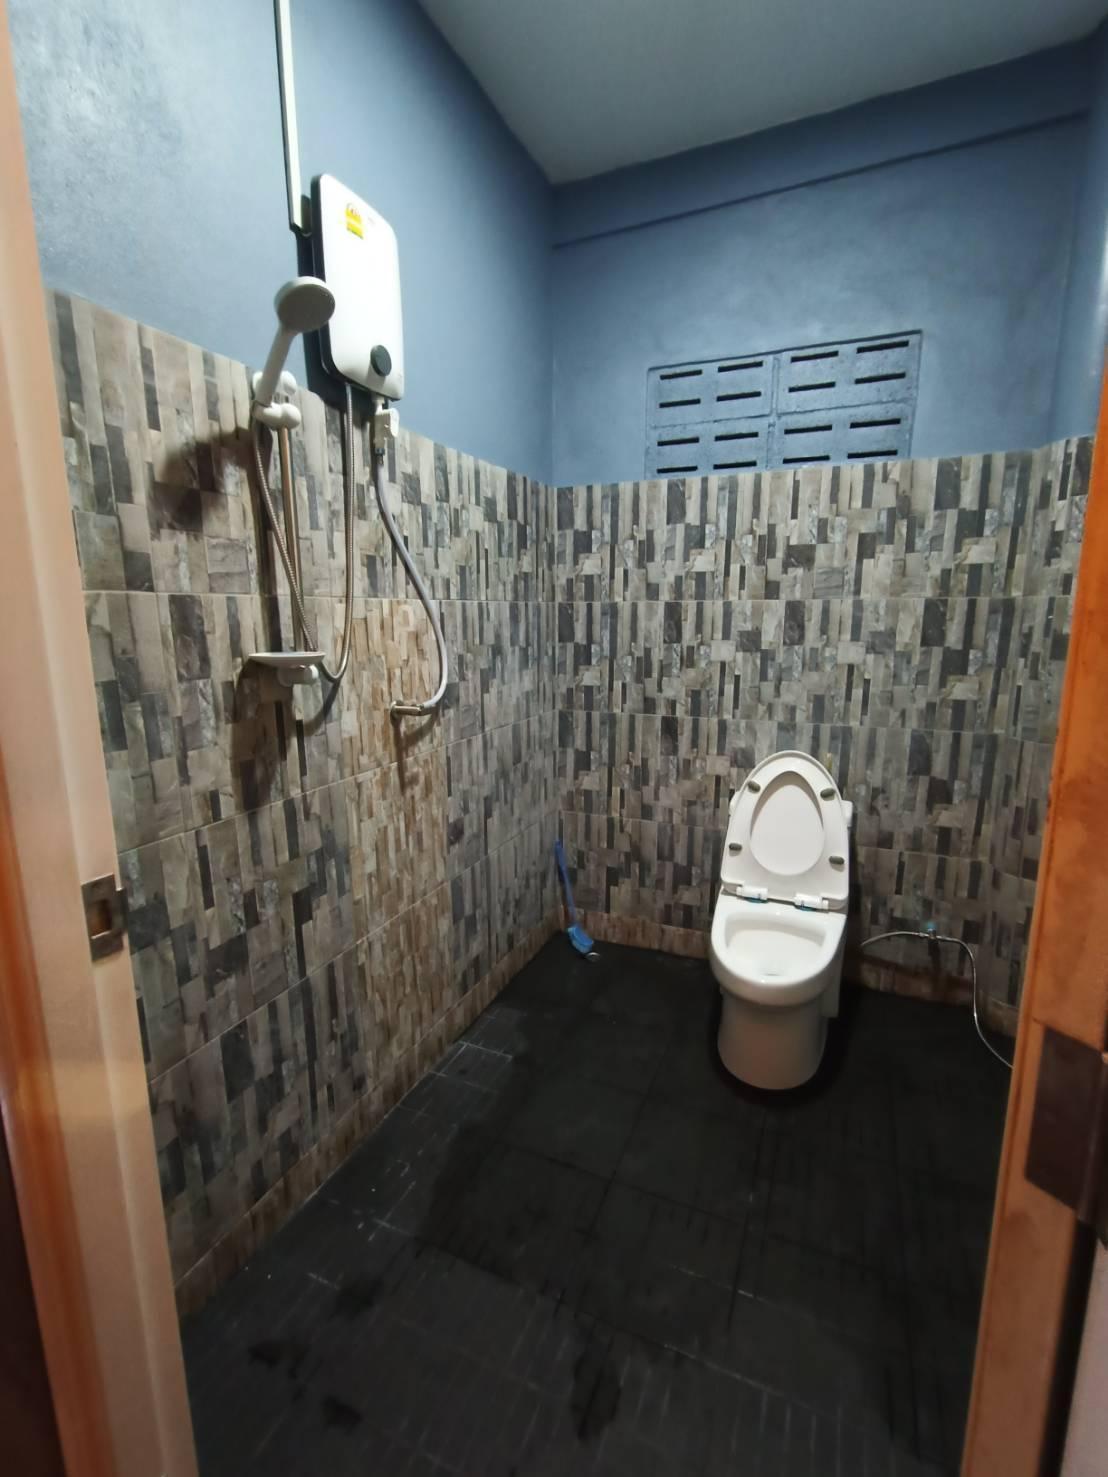 Garden house วิลลา 1 ห้องนอน 1 ห้องน้ำส่วนตัว ขนาด 50 ตร.ม. – บางปู